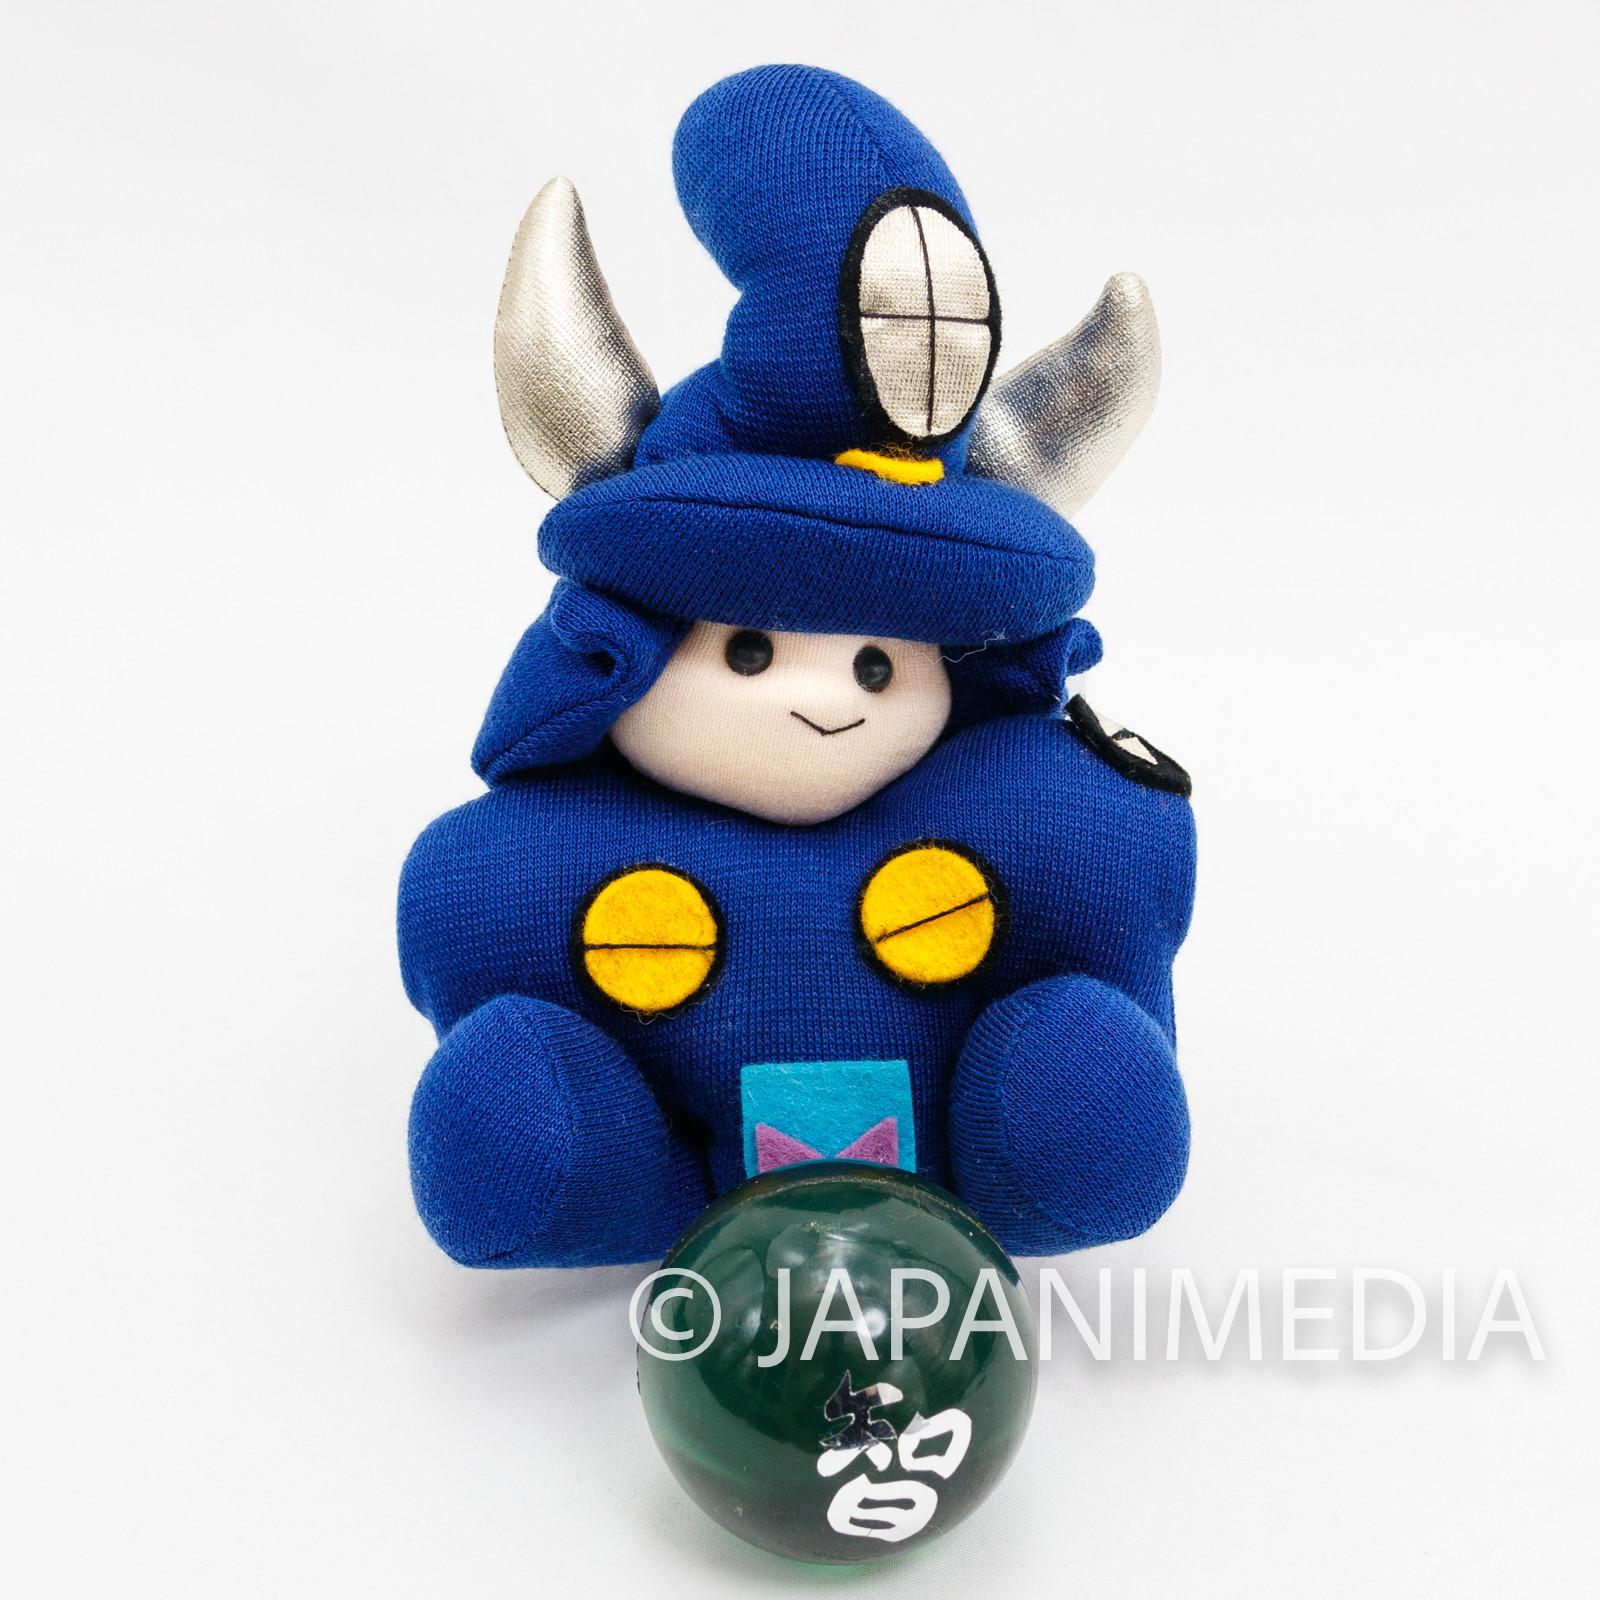 RARE!! Ronin Warriors Samurai Troopers Rowen of the Strata Plush Doll